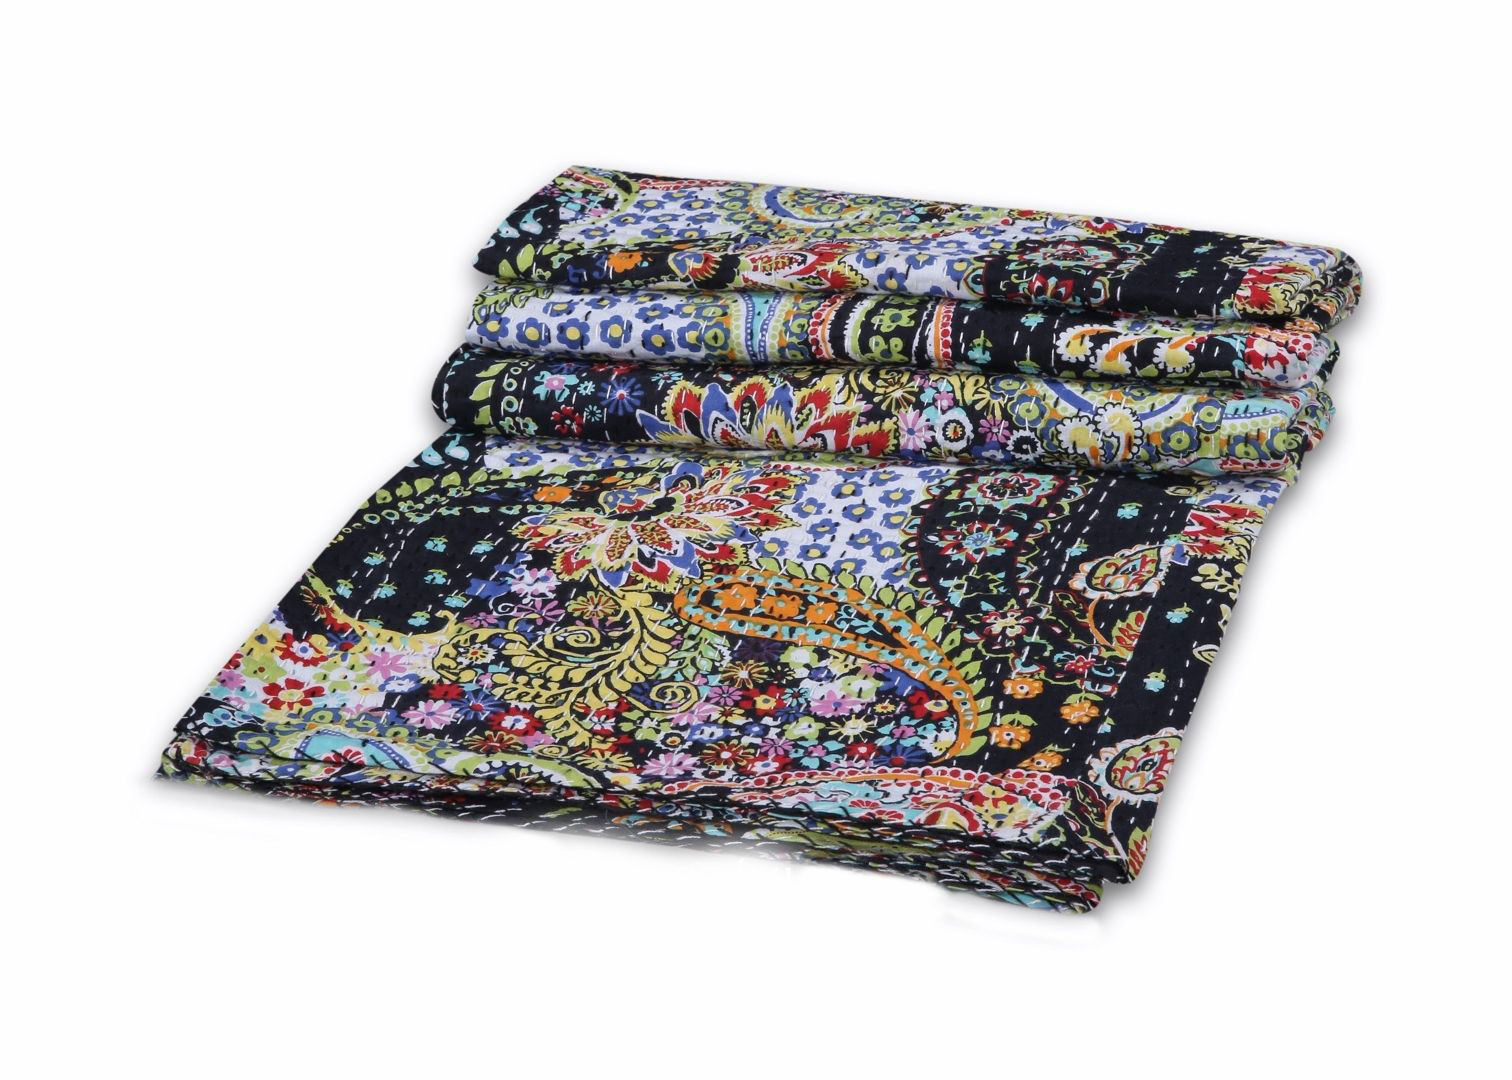 Paisley Print Kantha Quilt Twin Size Throw Bedspread Boho Hippie Gypsy Bohemian